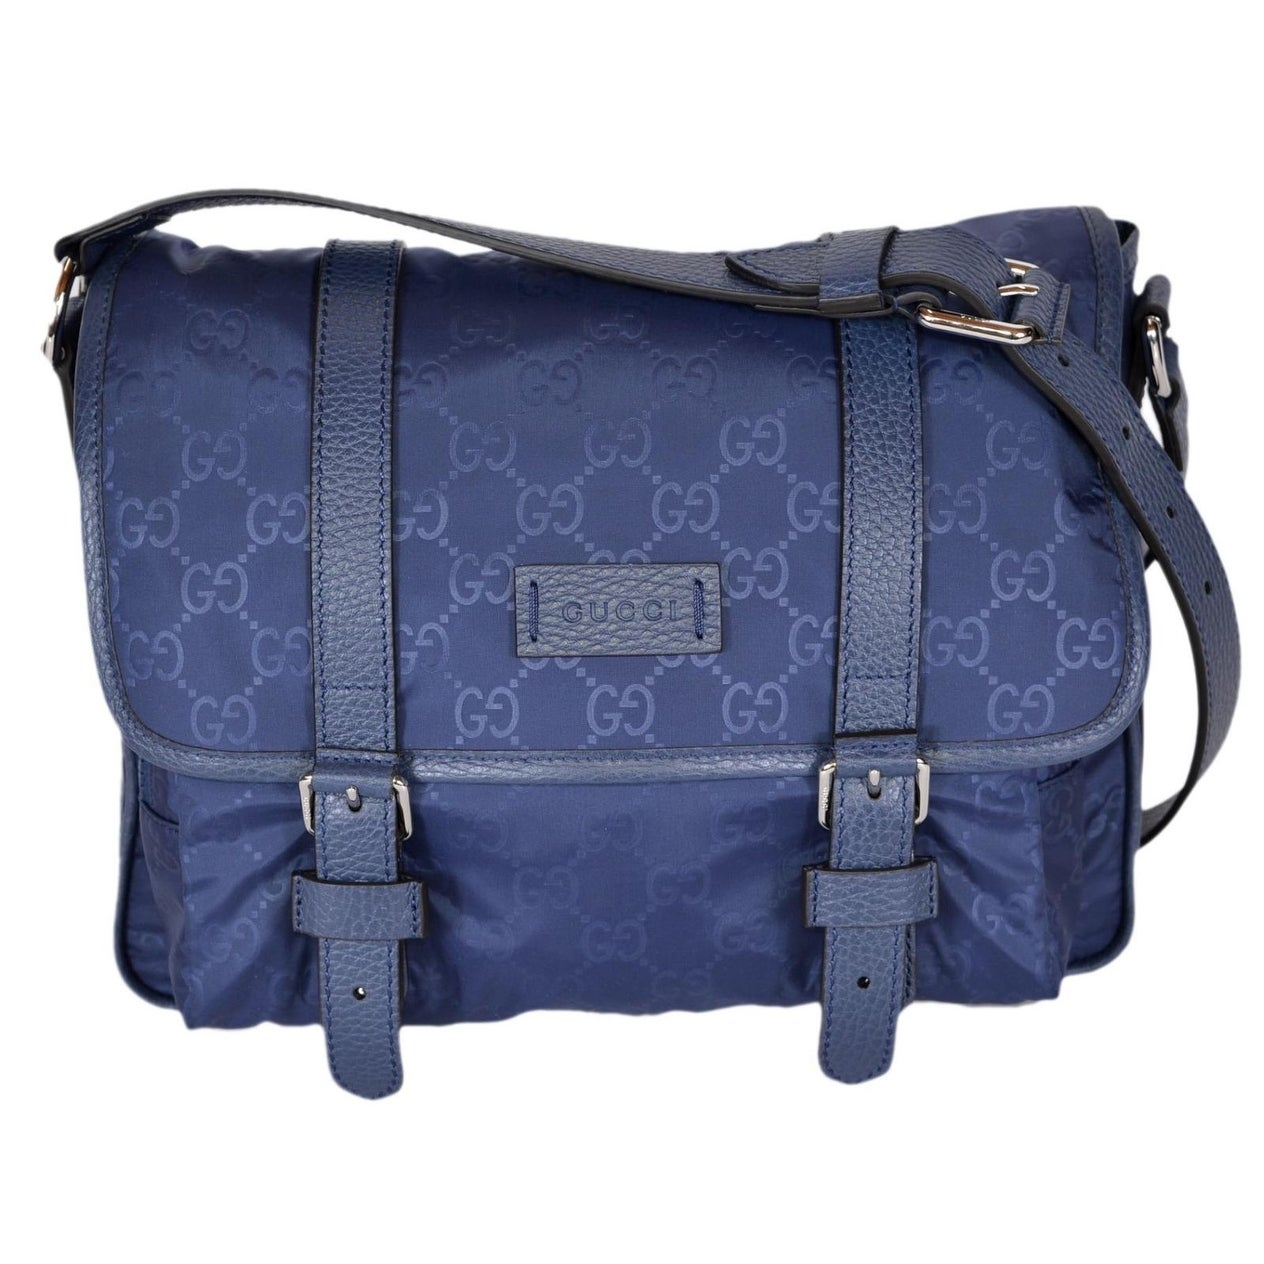 914ca015afd9 Shop Gucci 510335 Blue Nylon Leather GG Guccissima Messenger Bag Crossbody  Purse - 11.5